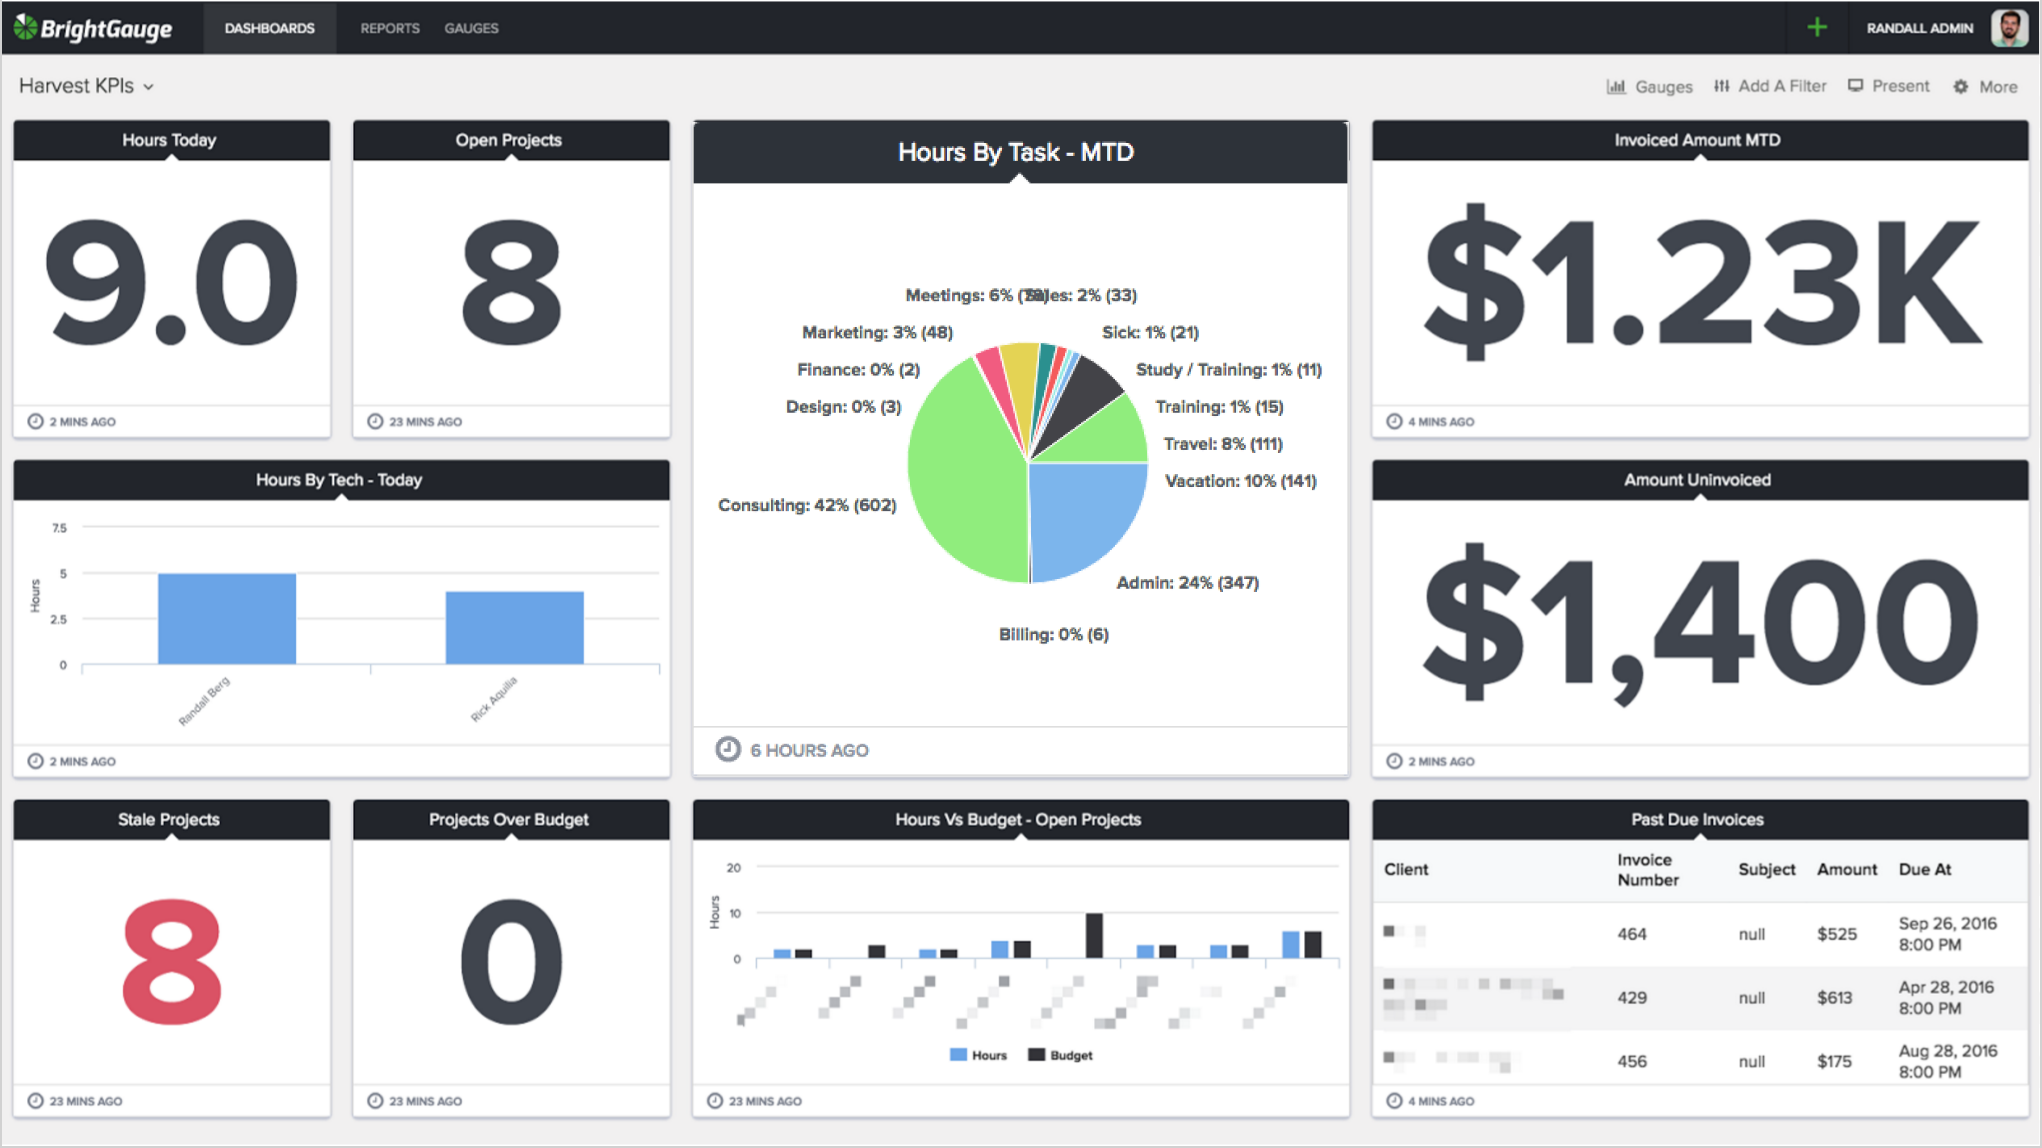 Harvest Time Tracking Software Integration Announced at BrightGauge